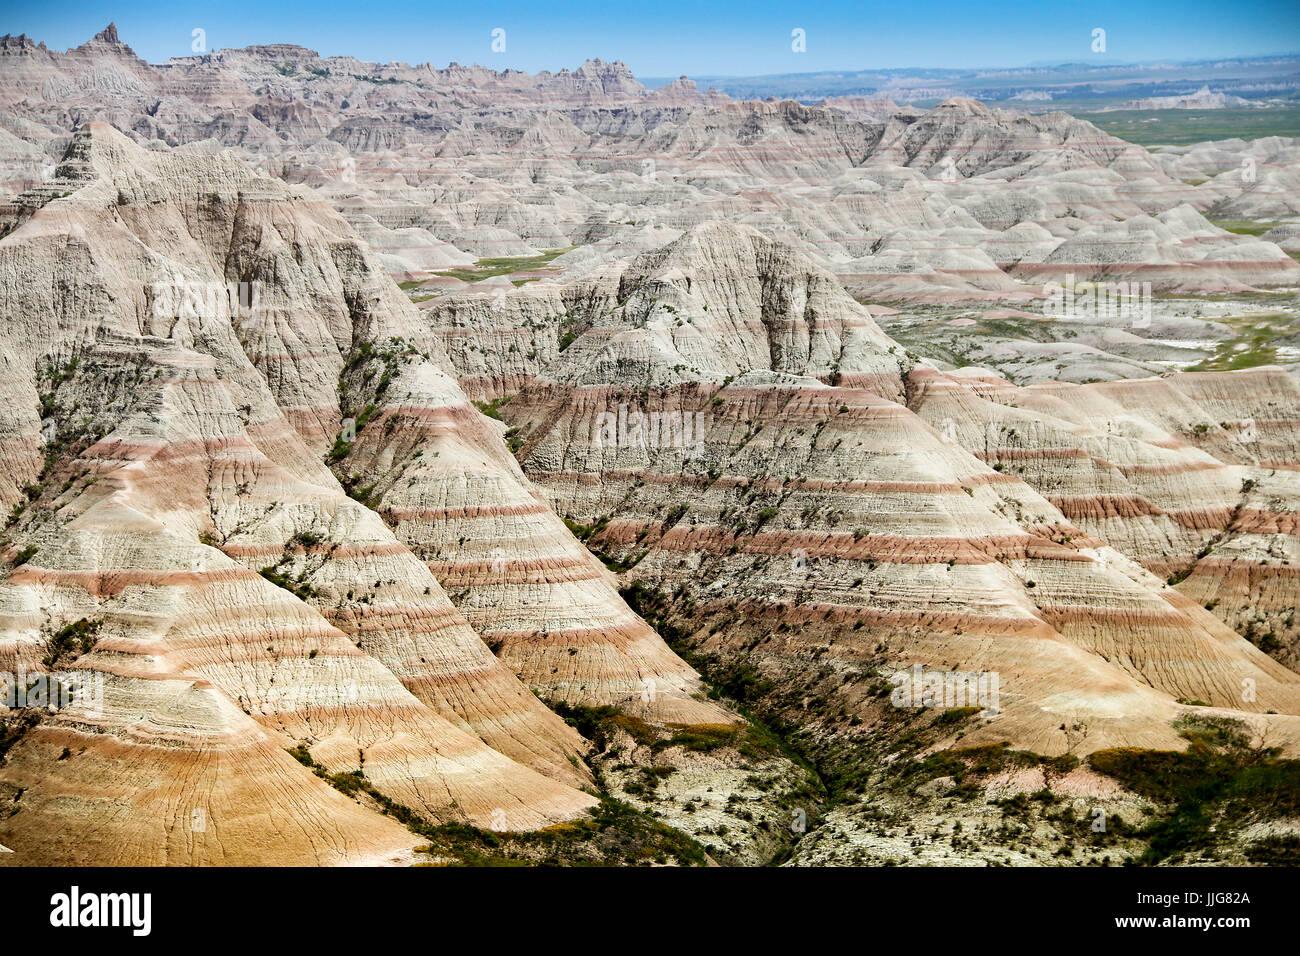 Parco nazionale Badlands Foto Stock